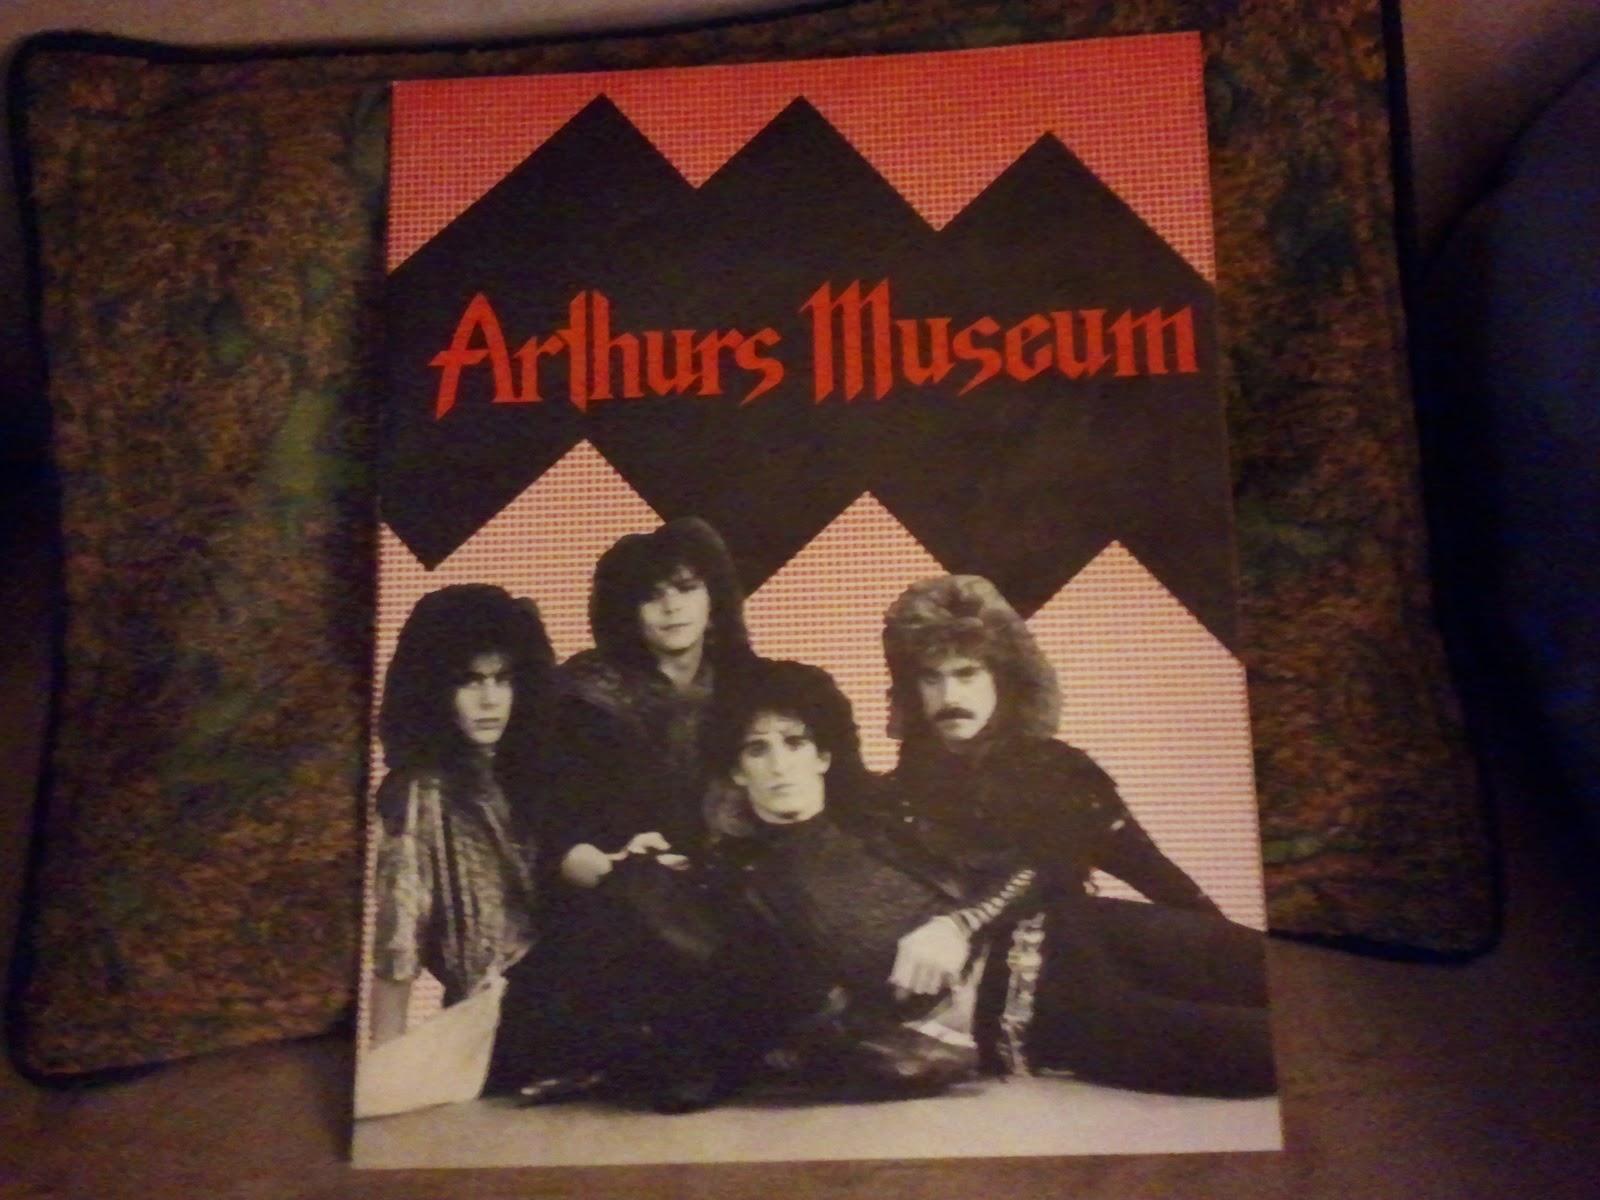 Arthurs museum Bio folder